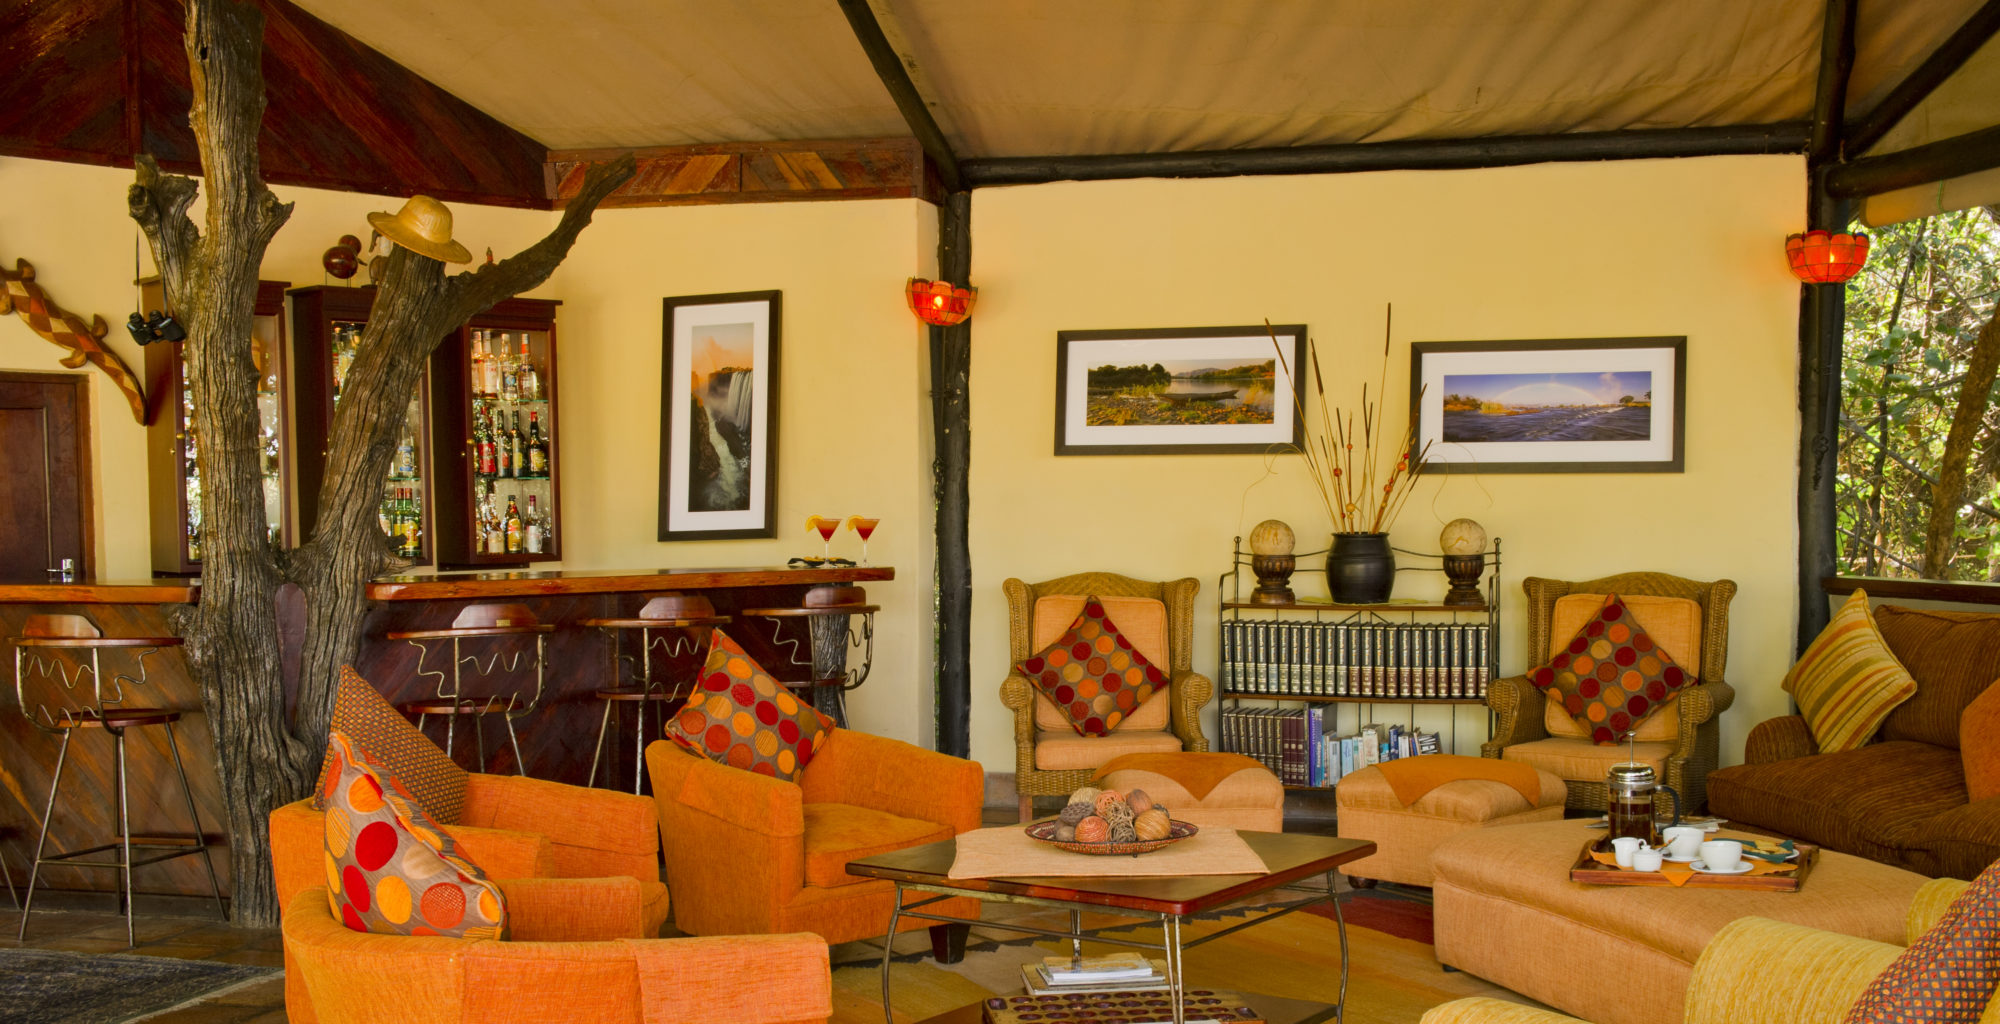 Island-of-Siankaba-Zambia lounge area